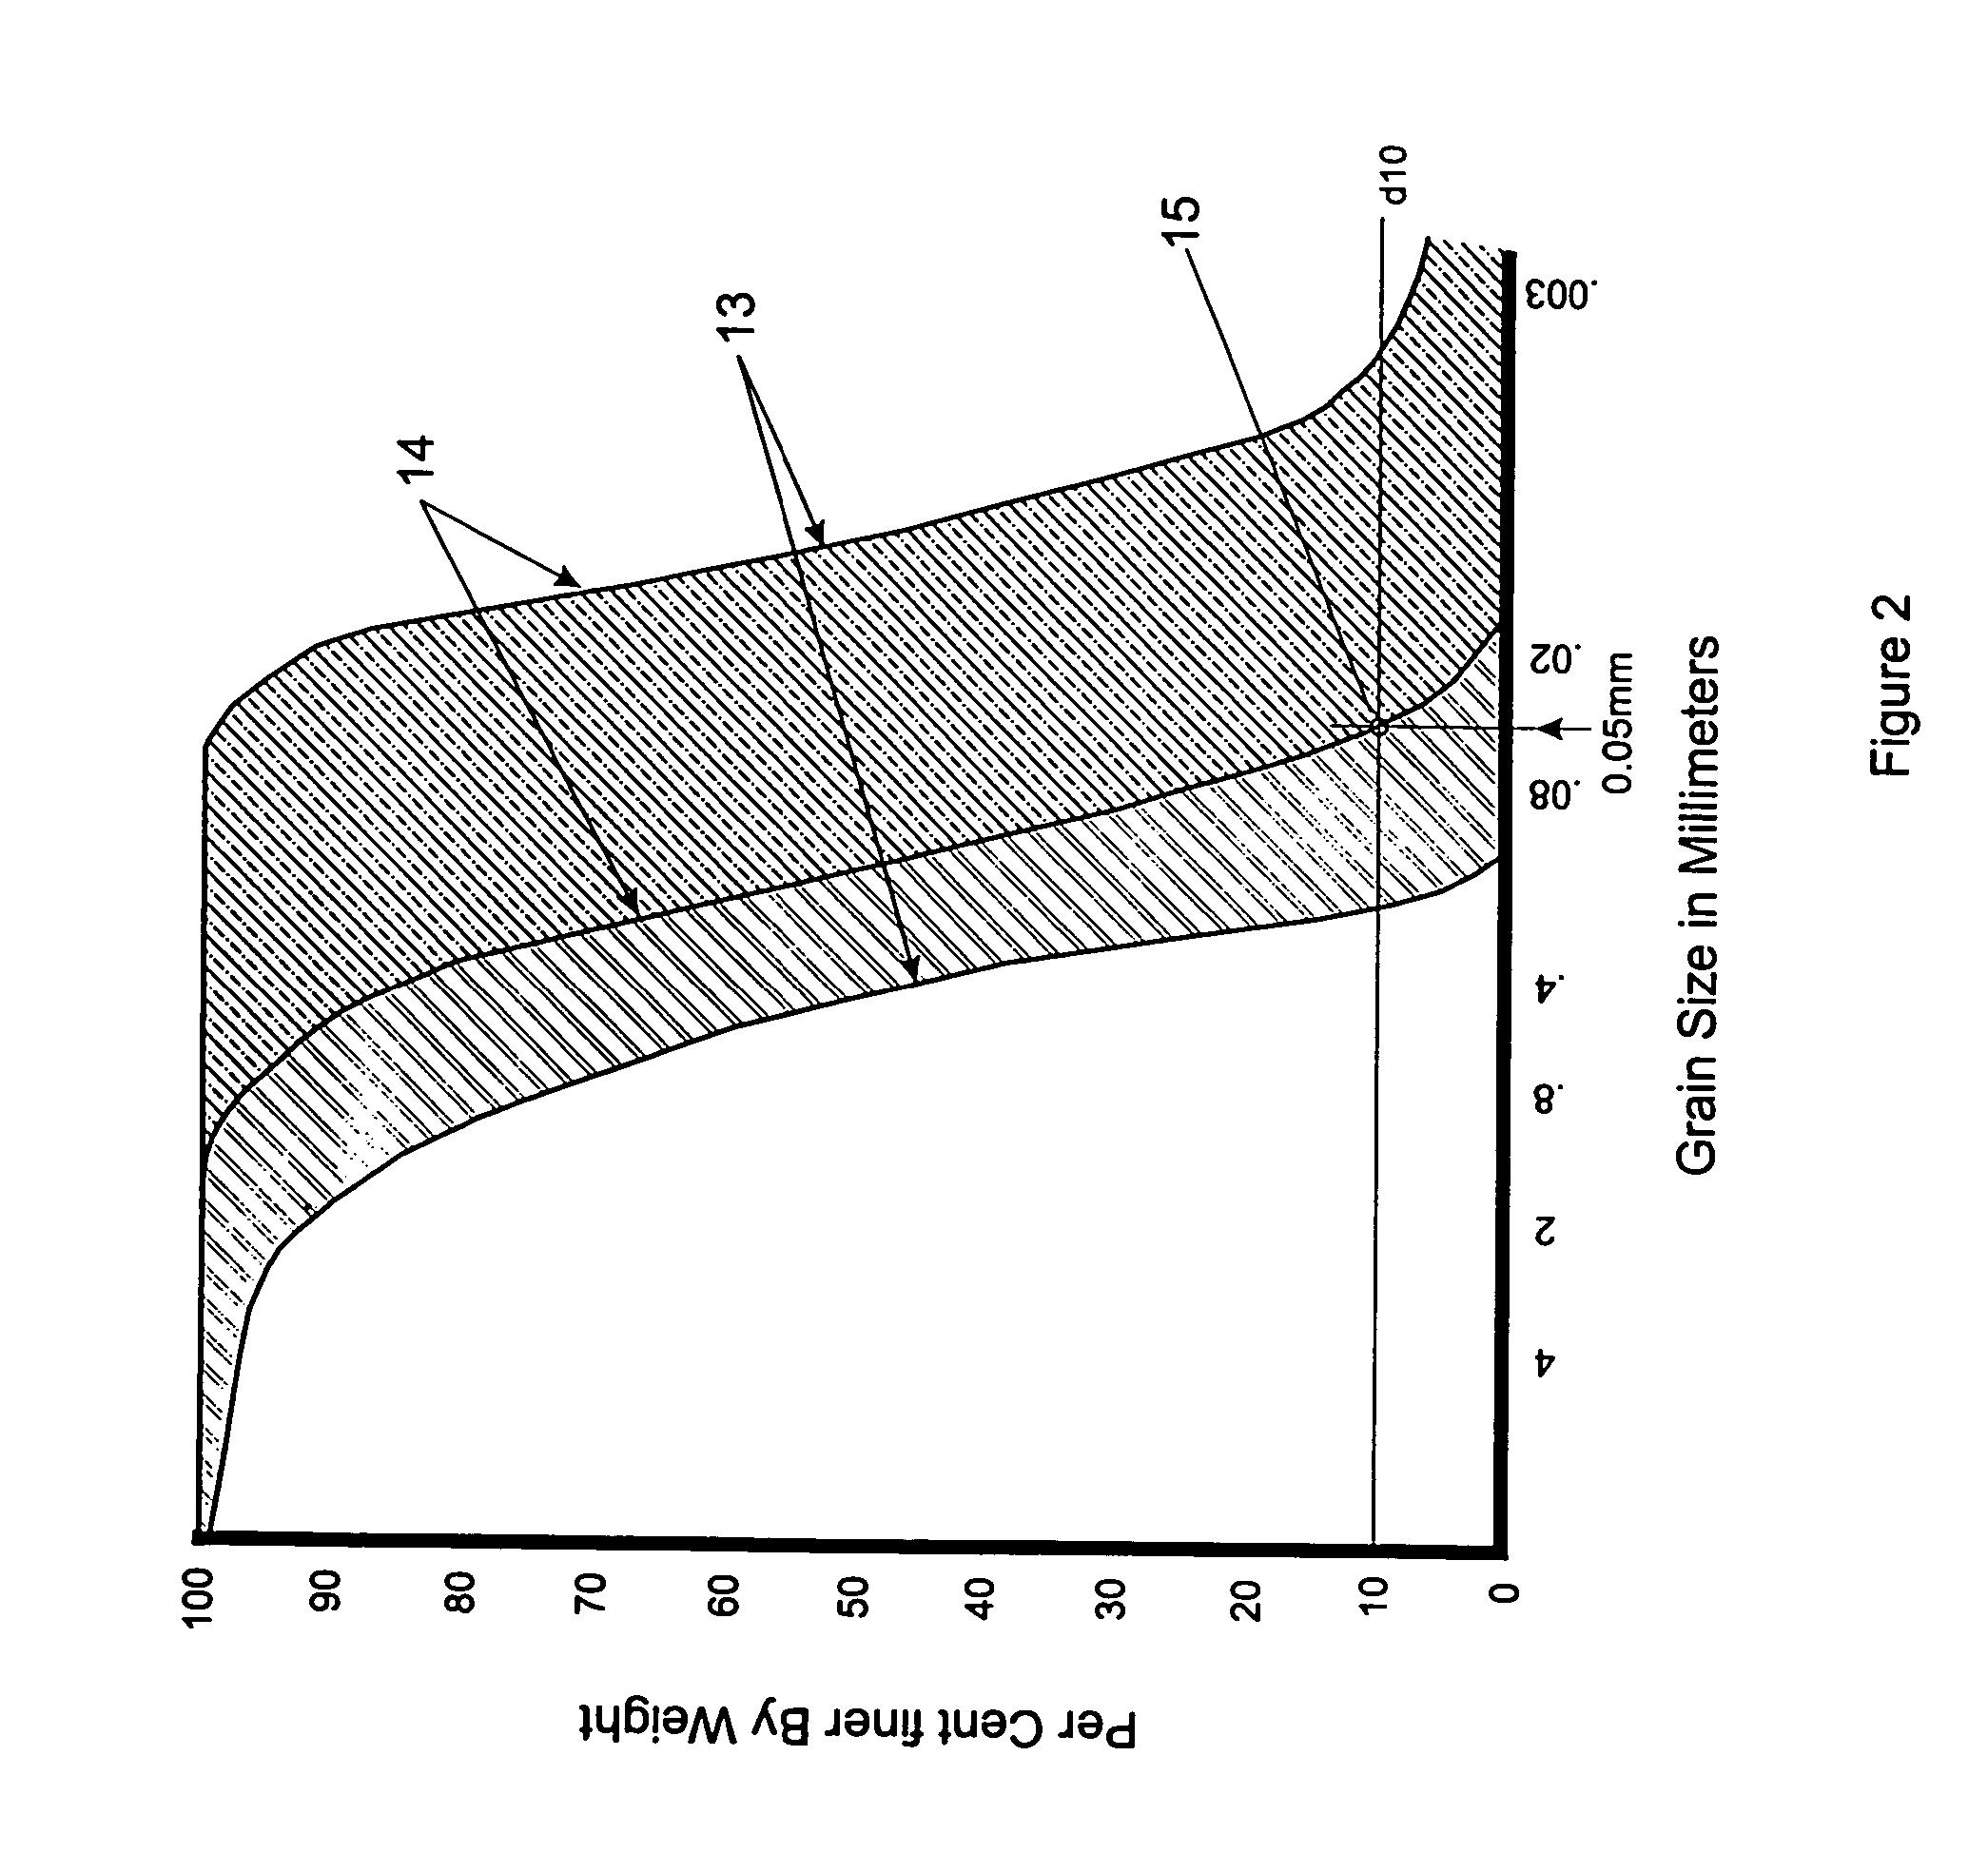 patent us7331143 - seismic base isolation by electro-osmosis